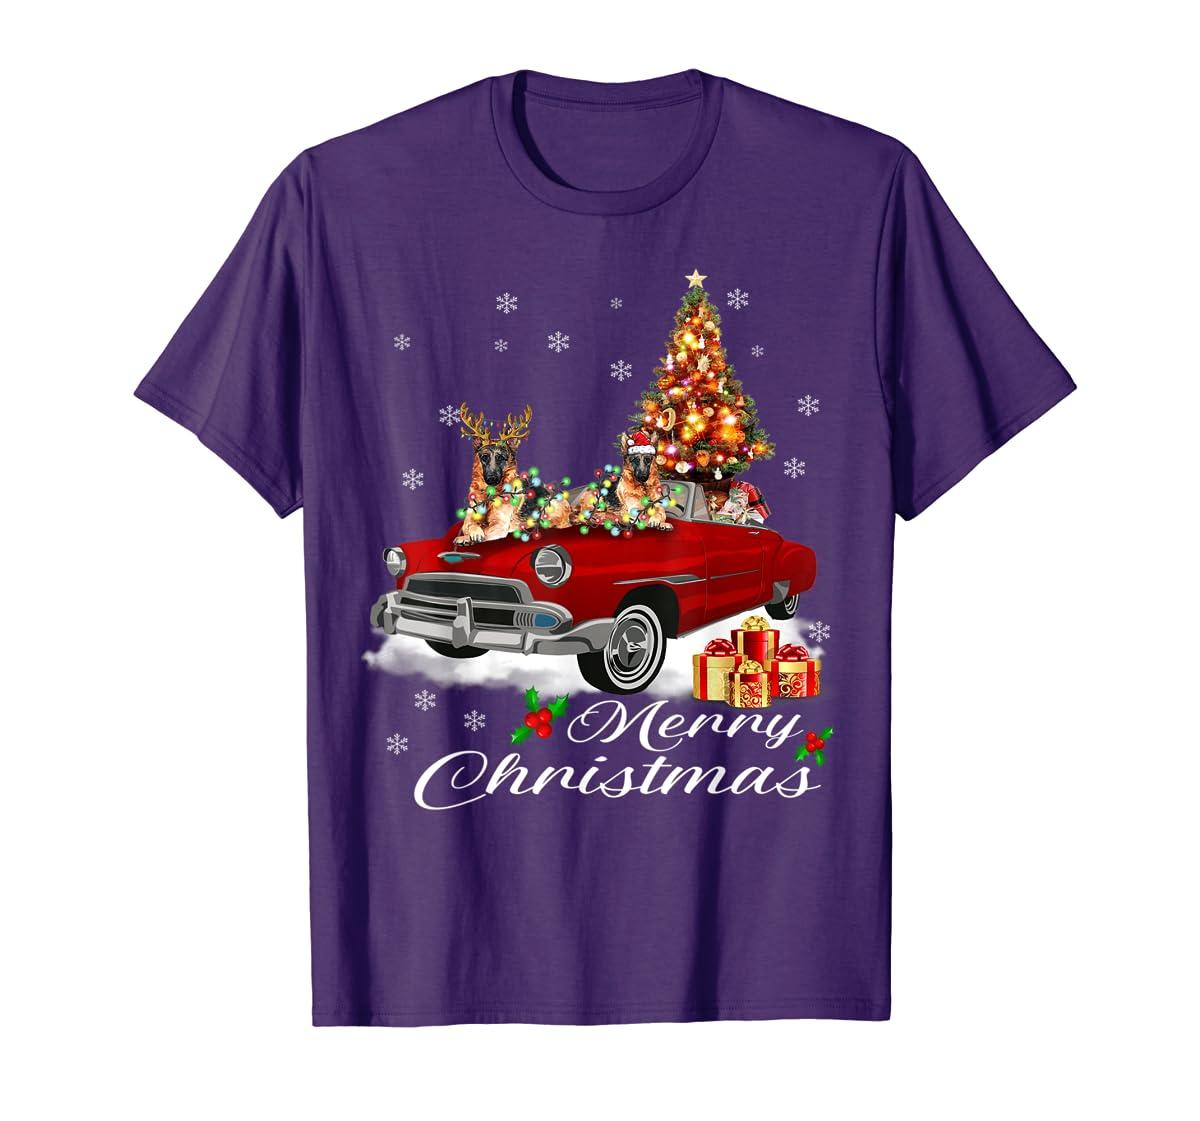 German Shepherd on Red Truck Christmas Pajama Dog Lover Gift T-Shirt-Men's T-Shirt-Purple